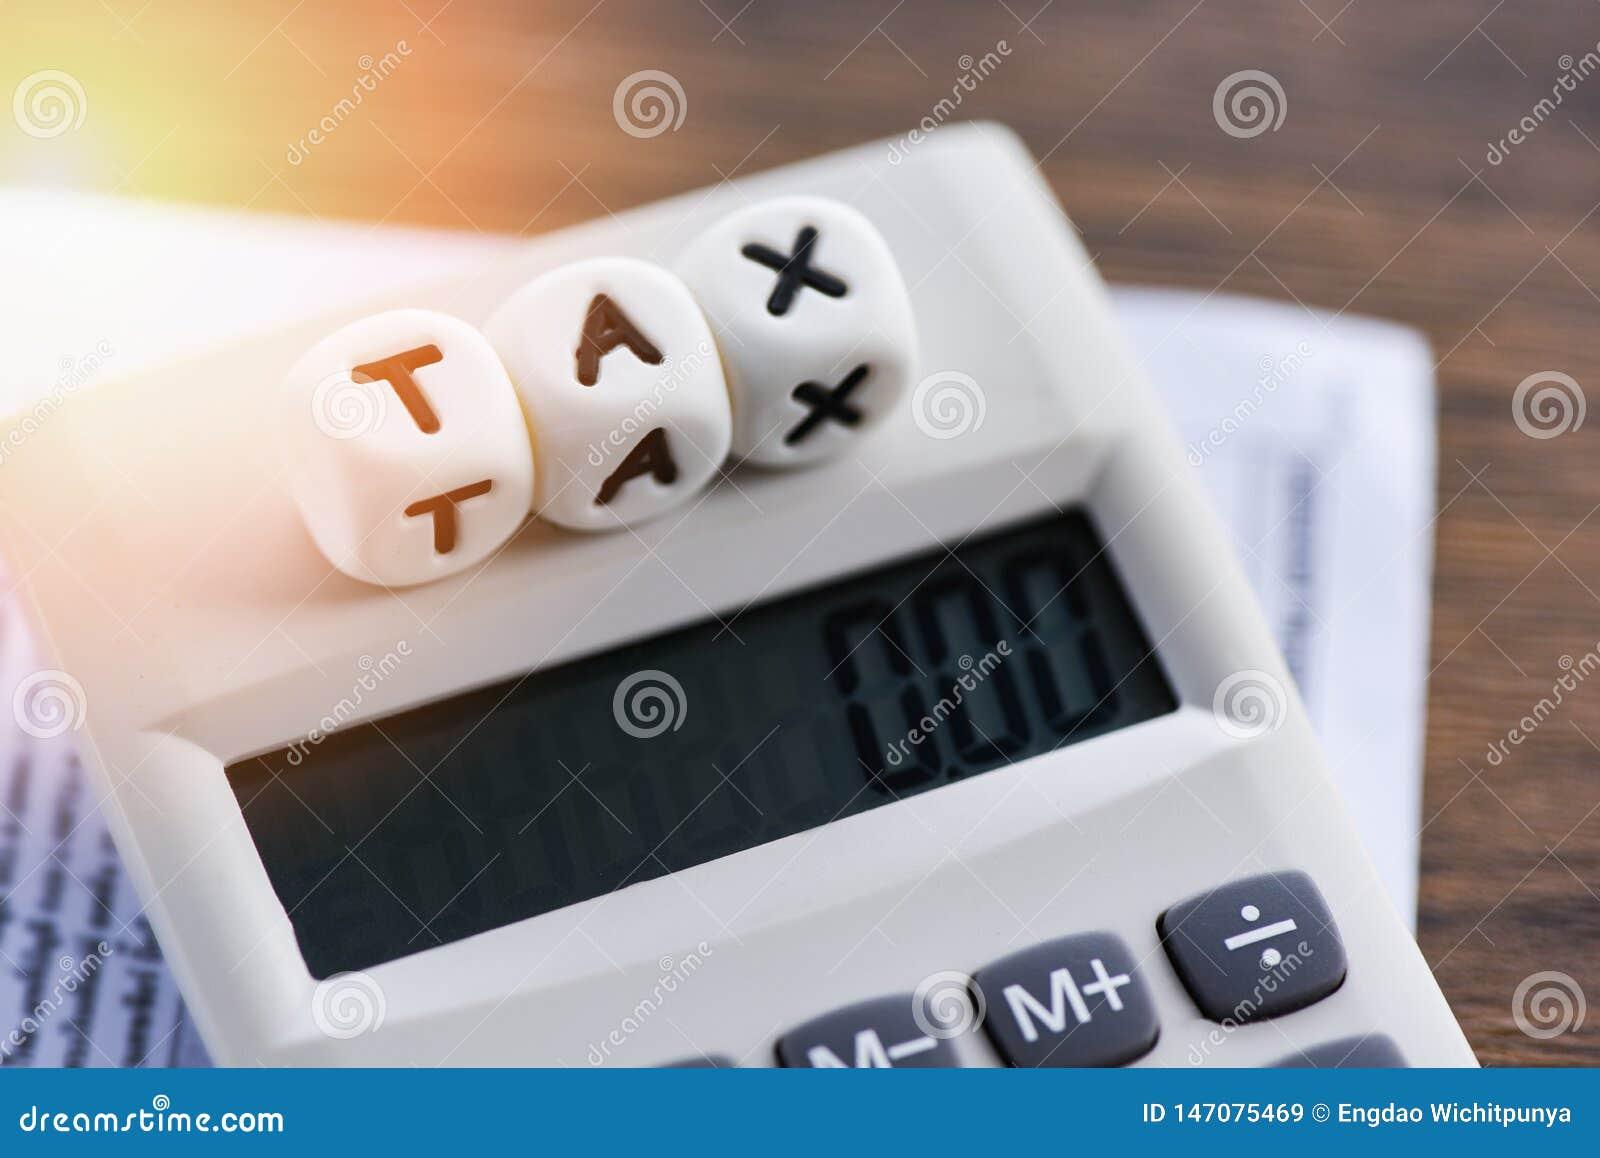 Palavras do imposto na calculadora nas finanças de papel da conta da fatura para o cálculo do imposto do tempo